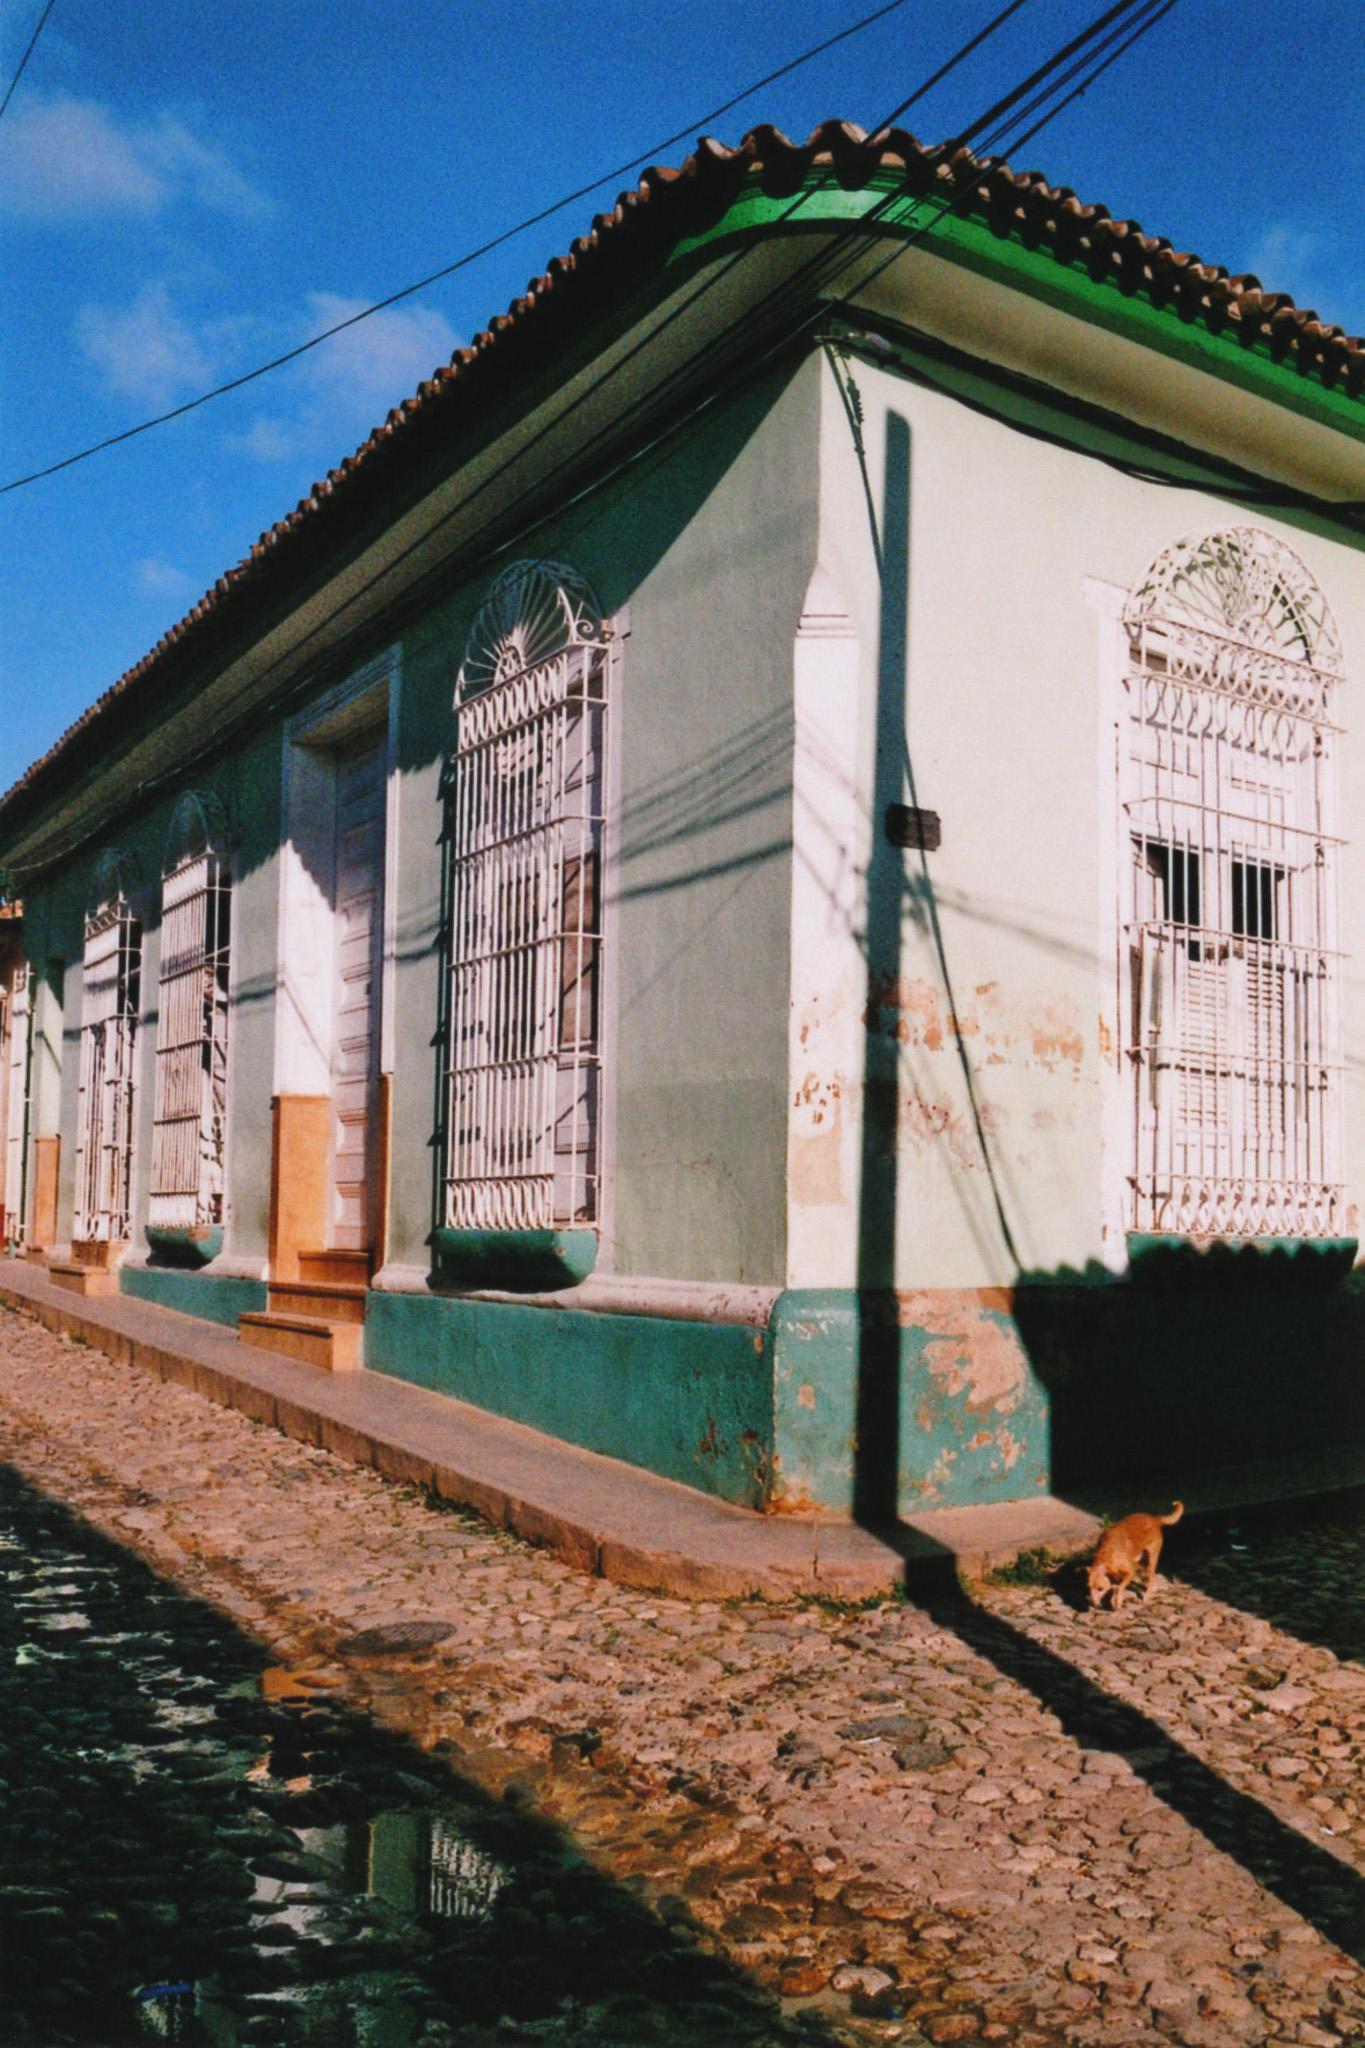 Kuba-2017-12-Analog-017.jpg